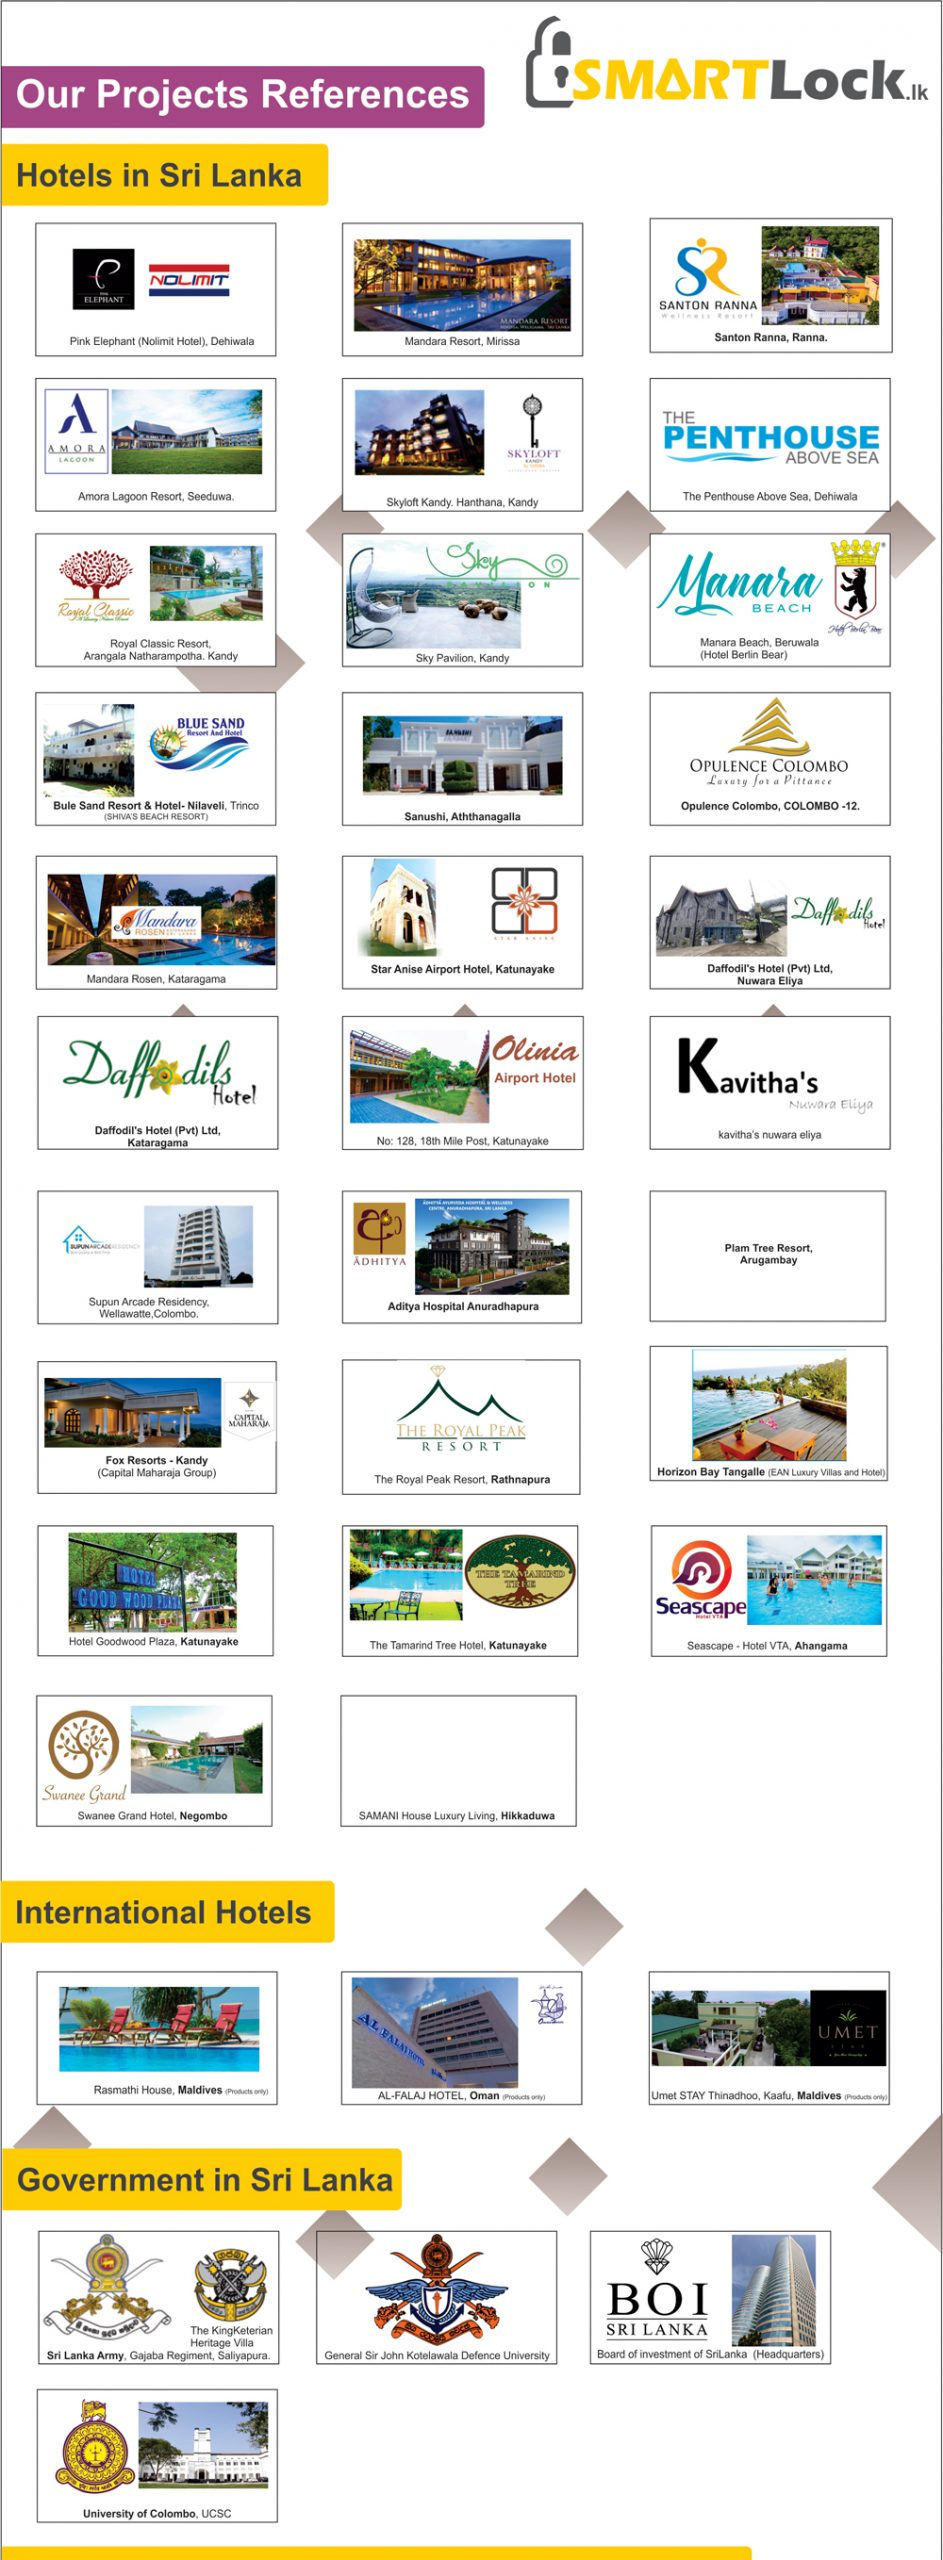 Smart Lock Keycard Lock Hotel In Sri Lanka